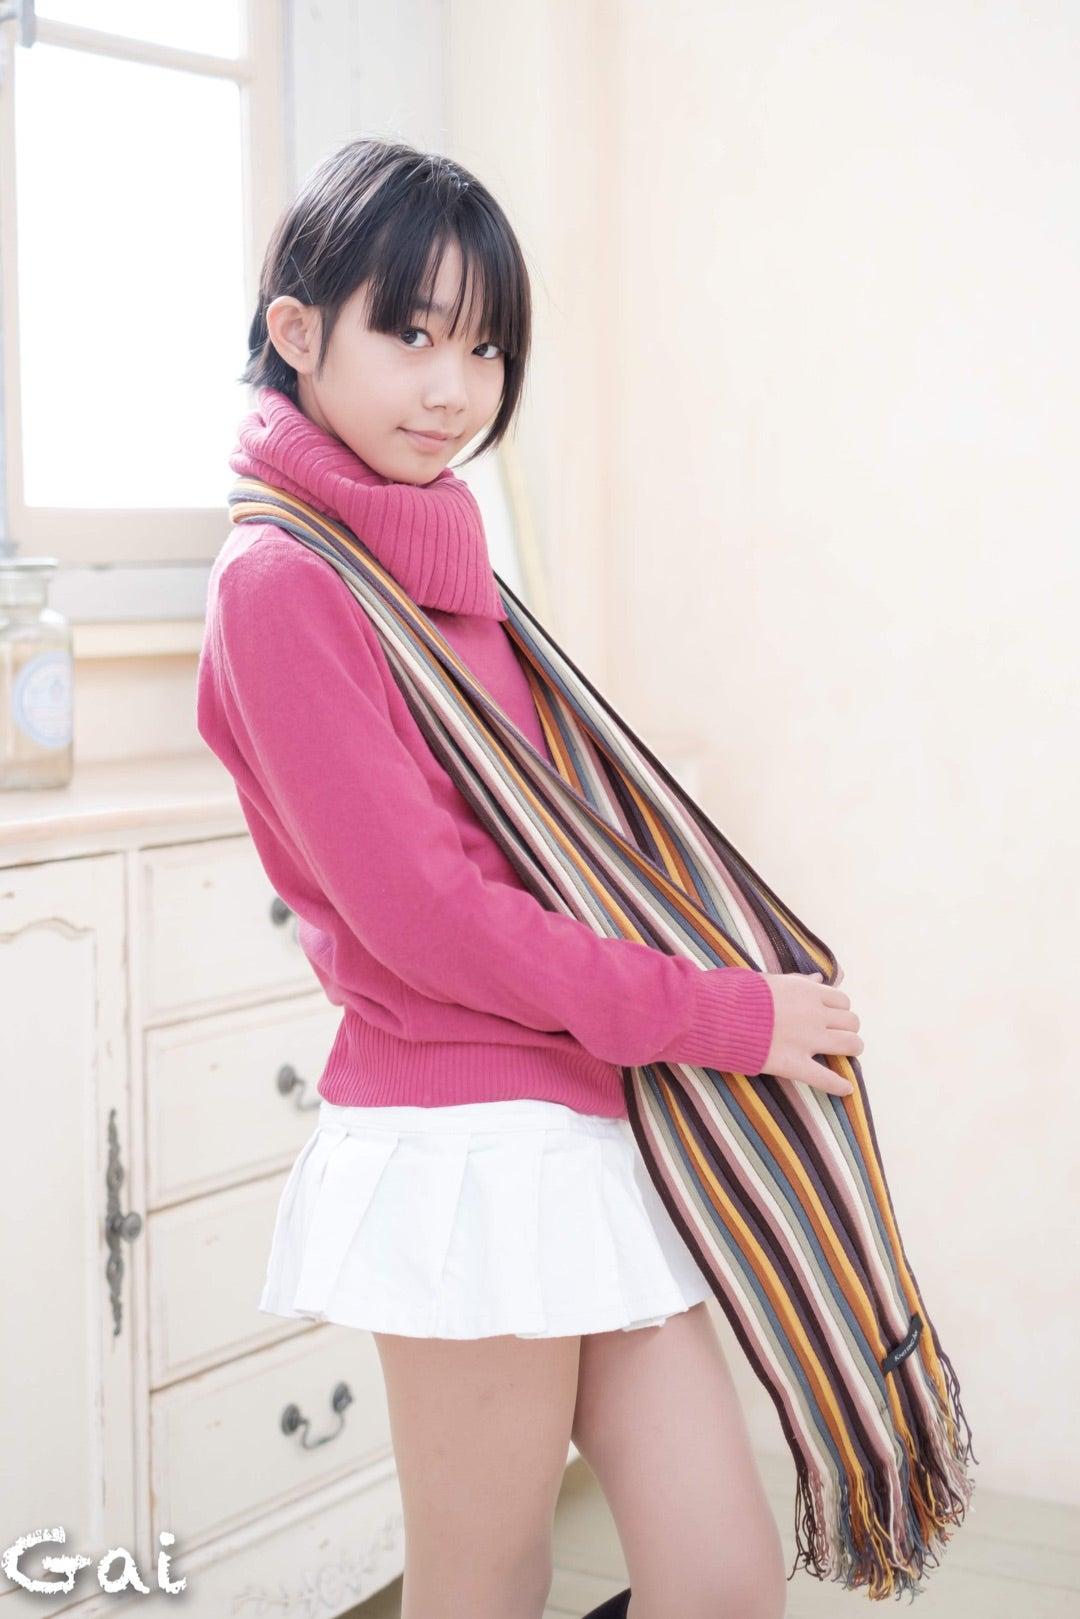 yukikax japanese teen nude